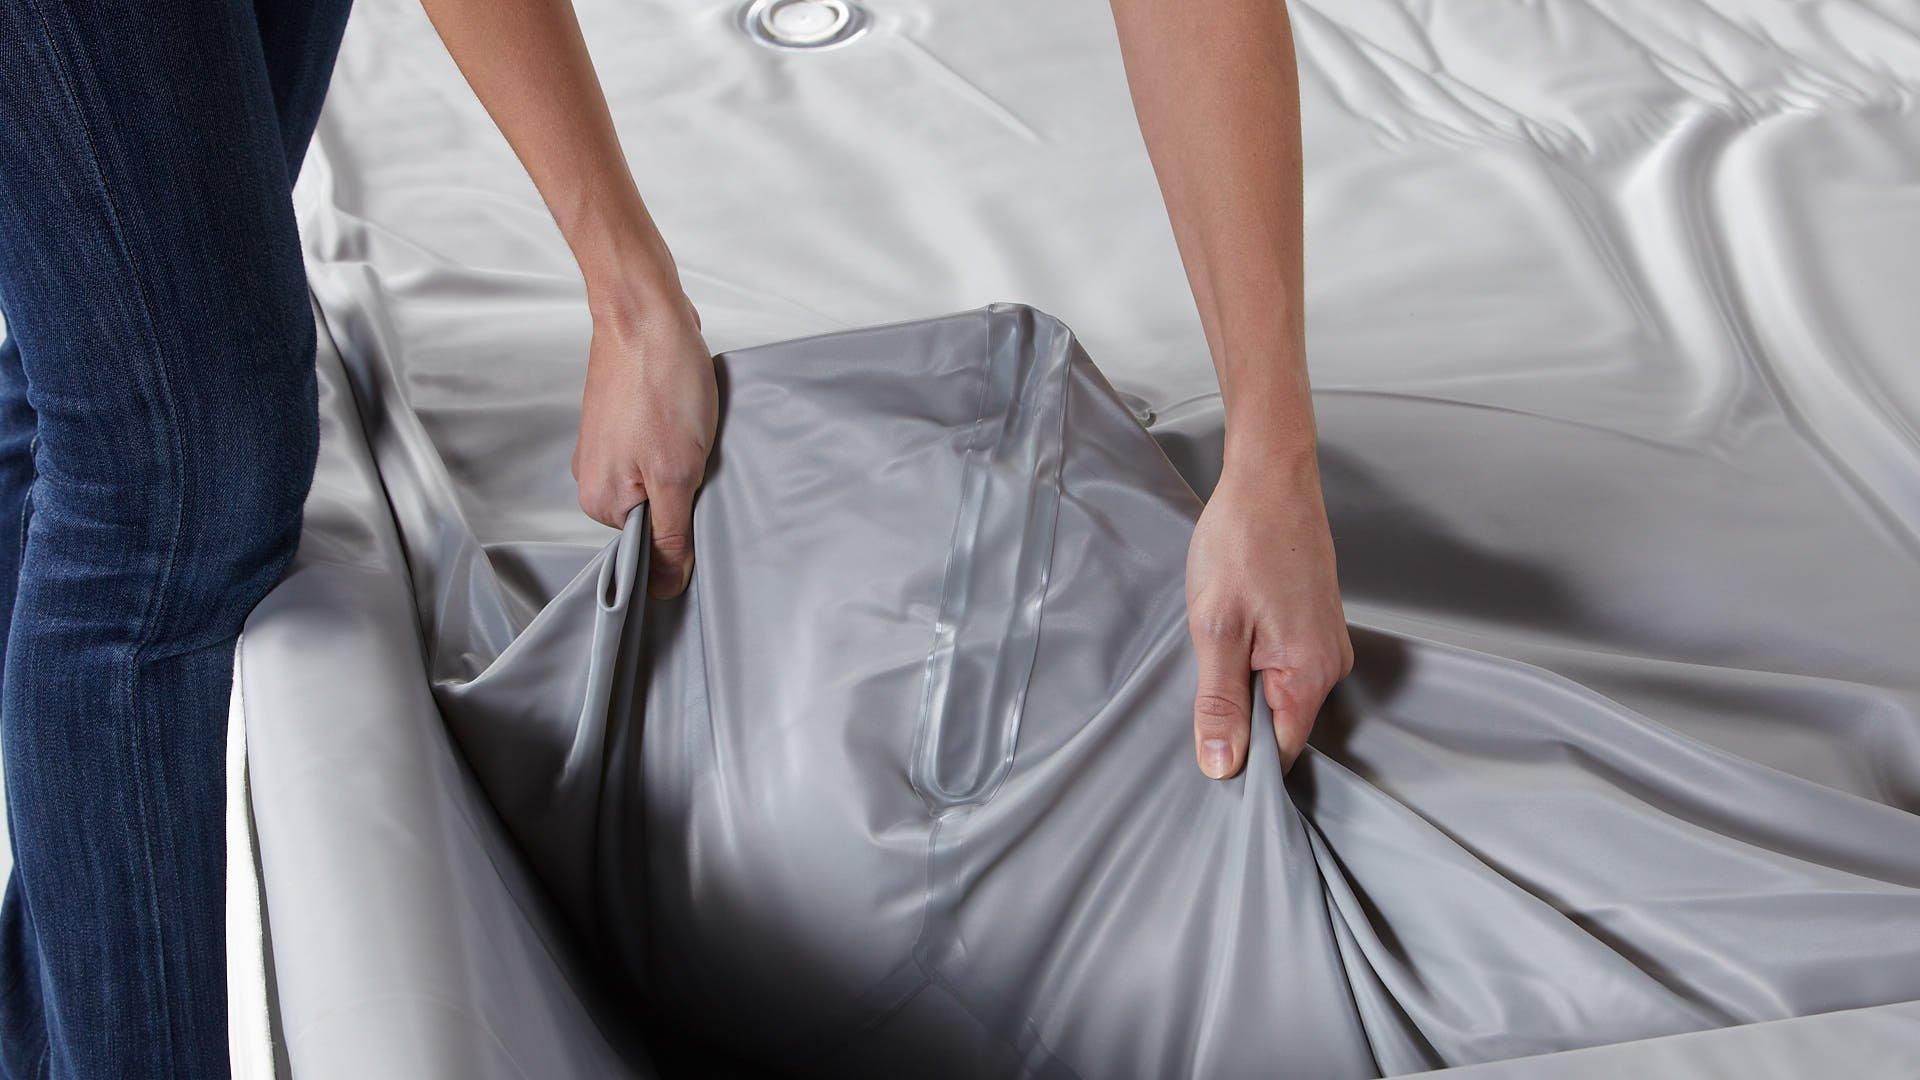 Wasserbettmatratze mit verstärkten Anti-Leck-Kanten